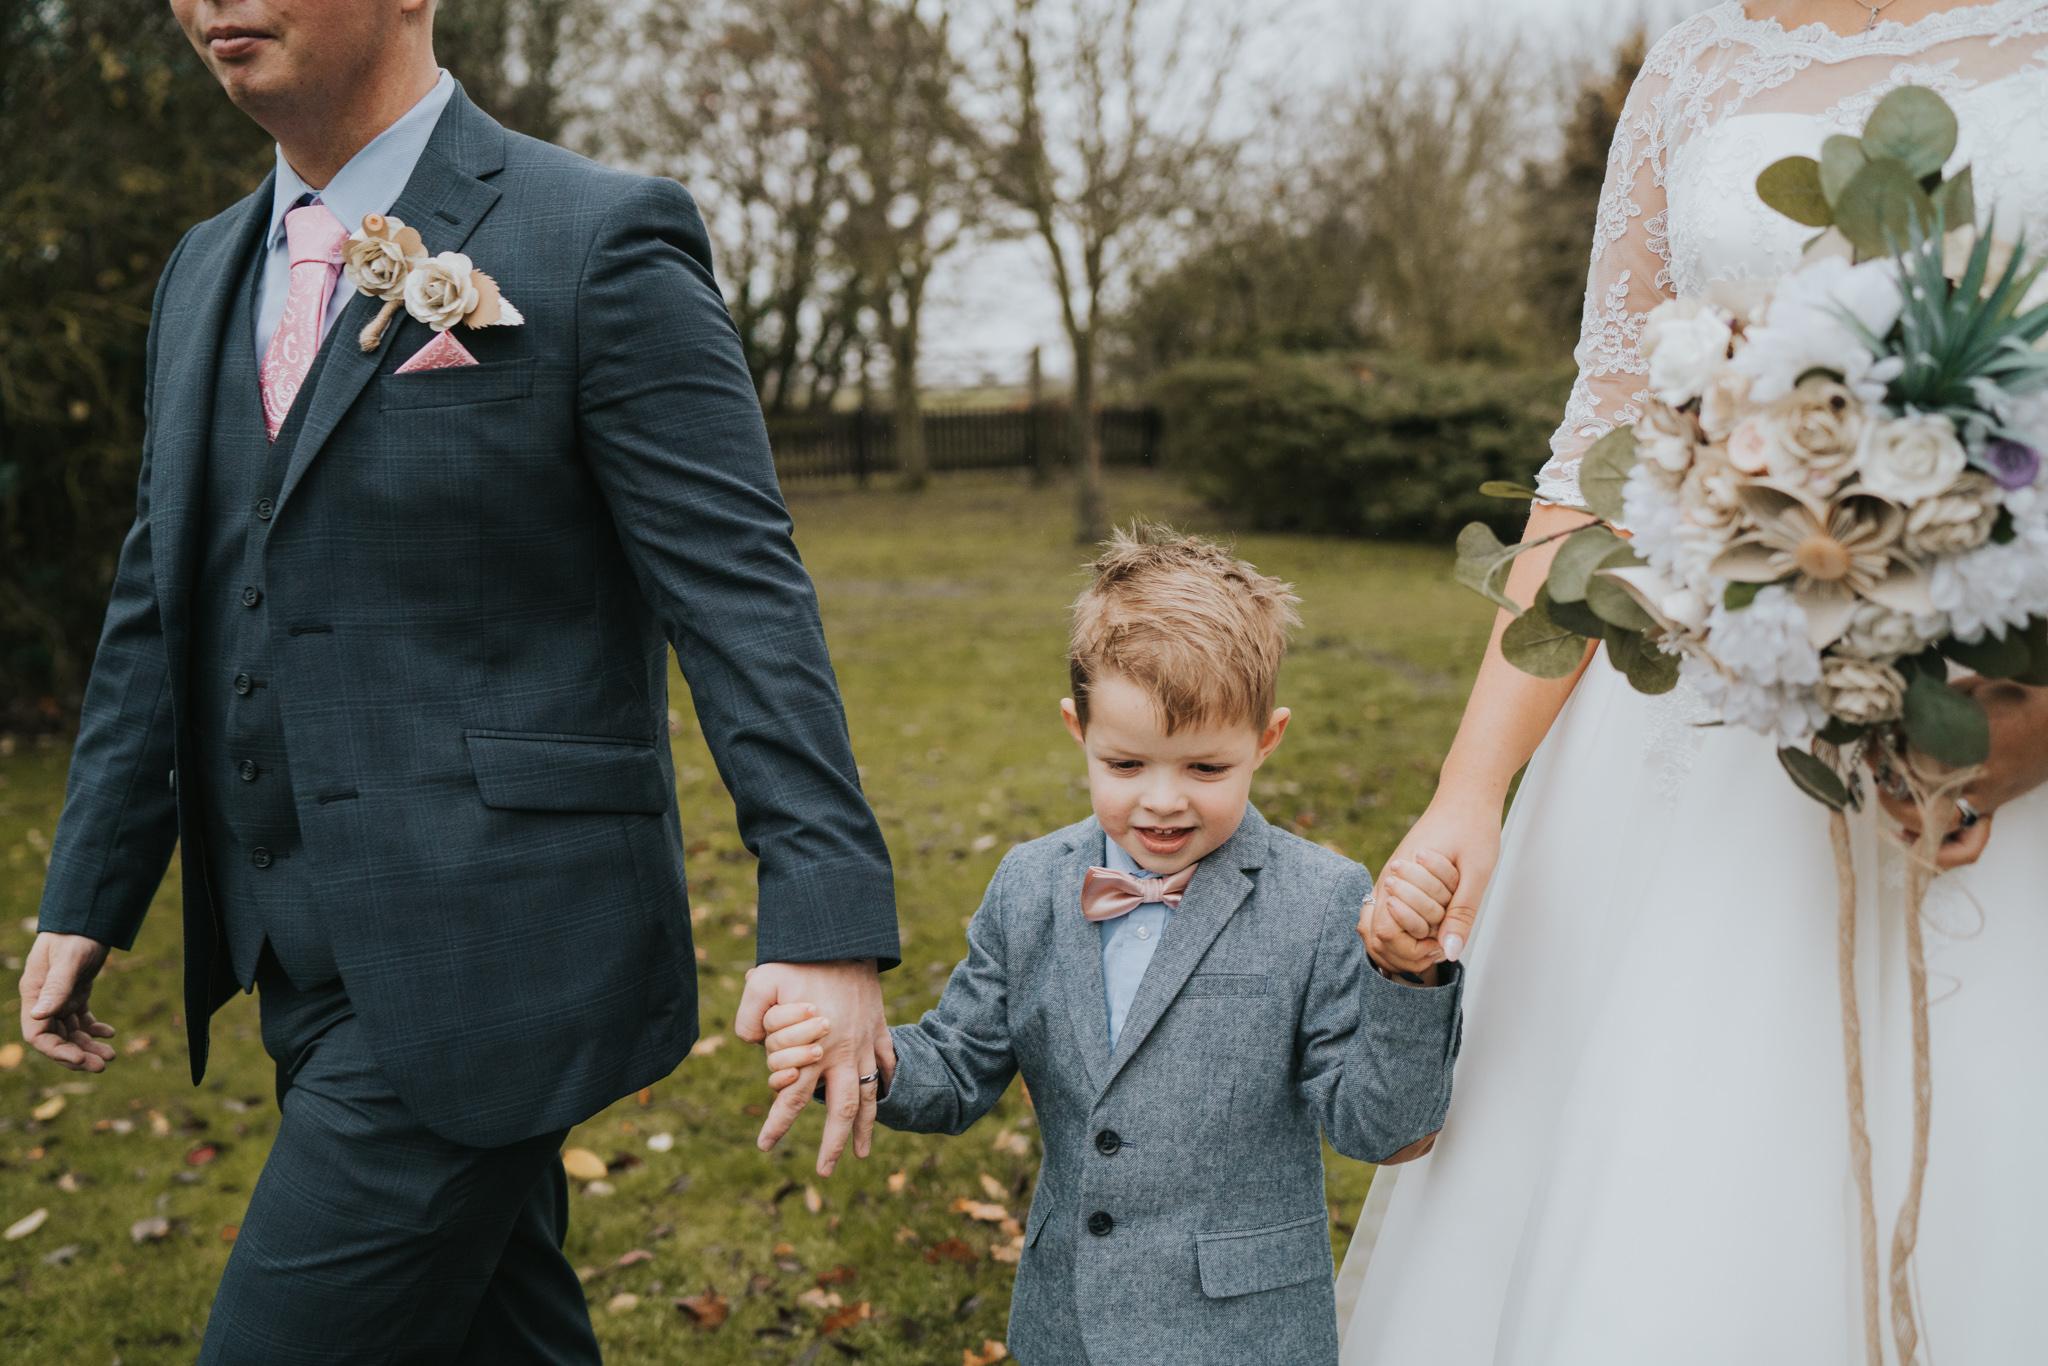 rhia-james-rustic-crabbs-barn-vintage-50s-retro-wedding-grace-elizabeth-colchester-essex-alternative-relaxed-wedding-family-photography-devon-suffolk-norfolk-essex (91 of 138).jpg